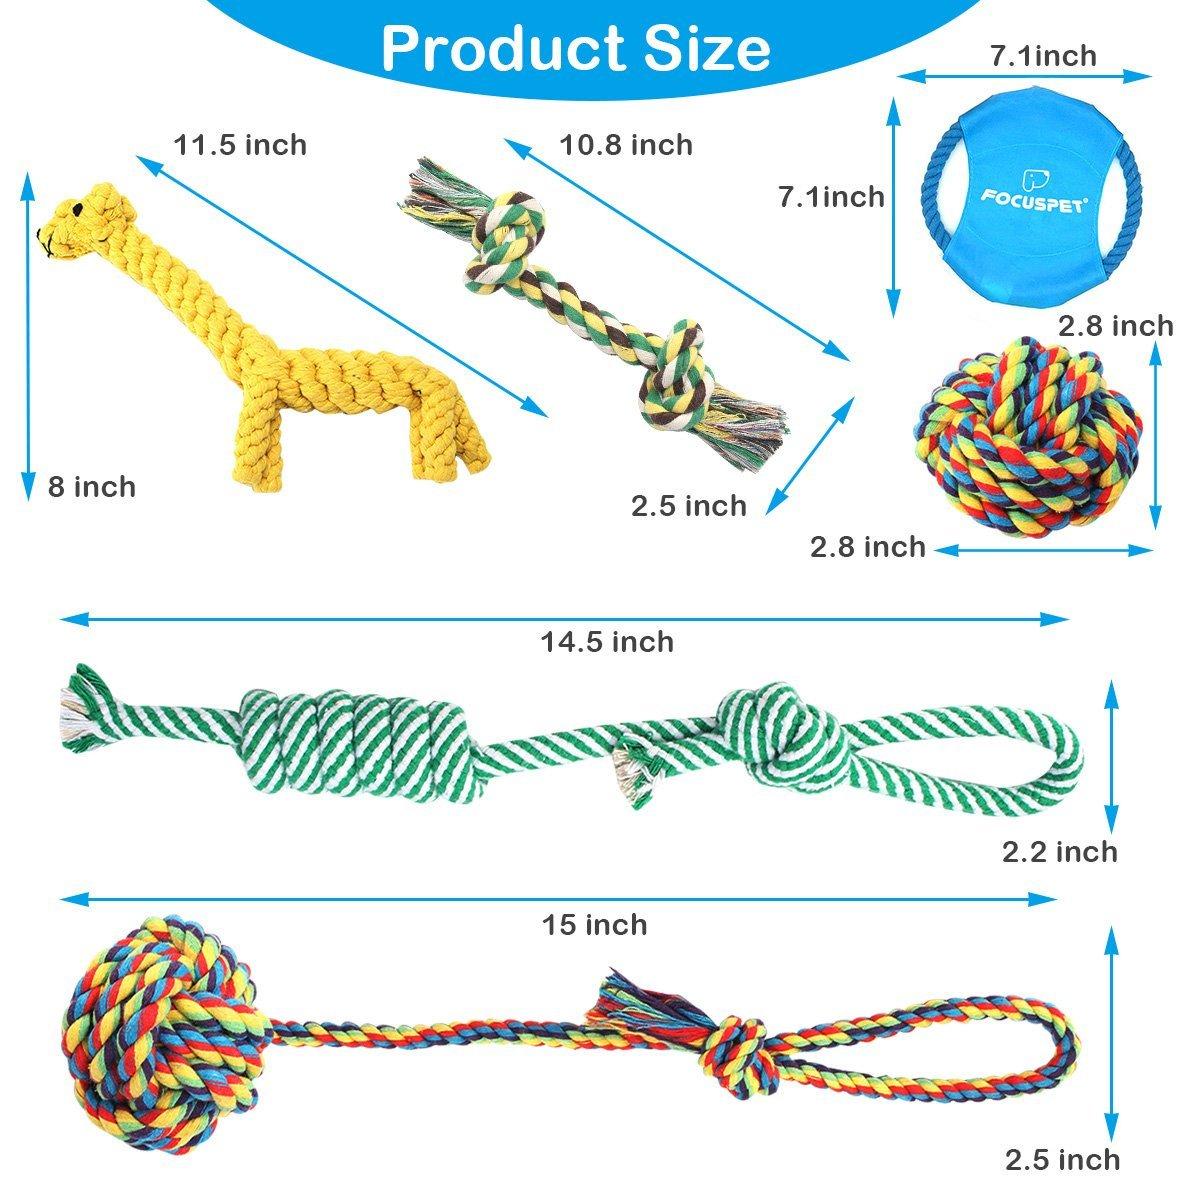 Focuspet Rope Toy Set